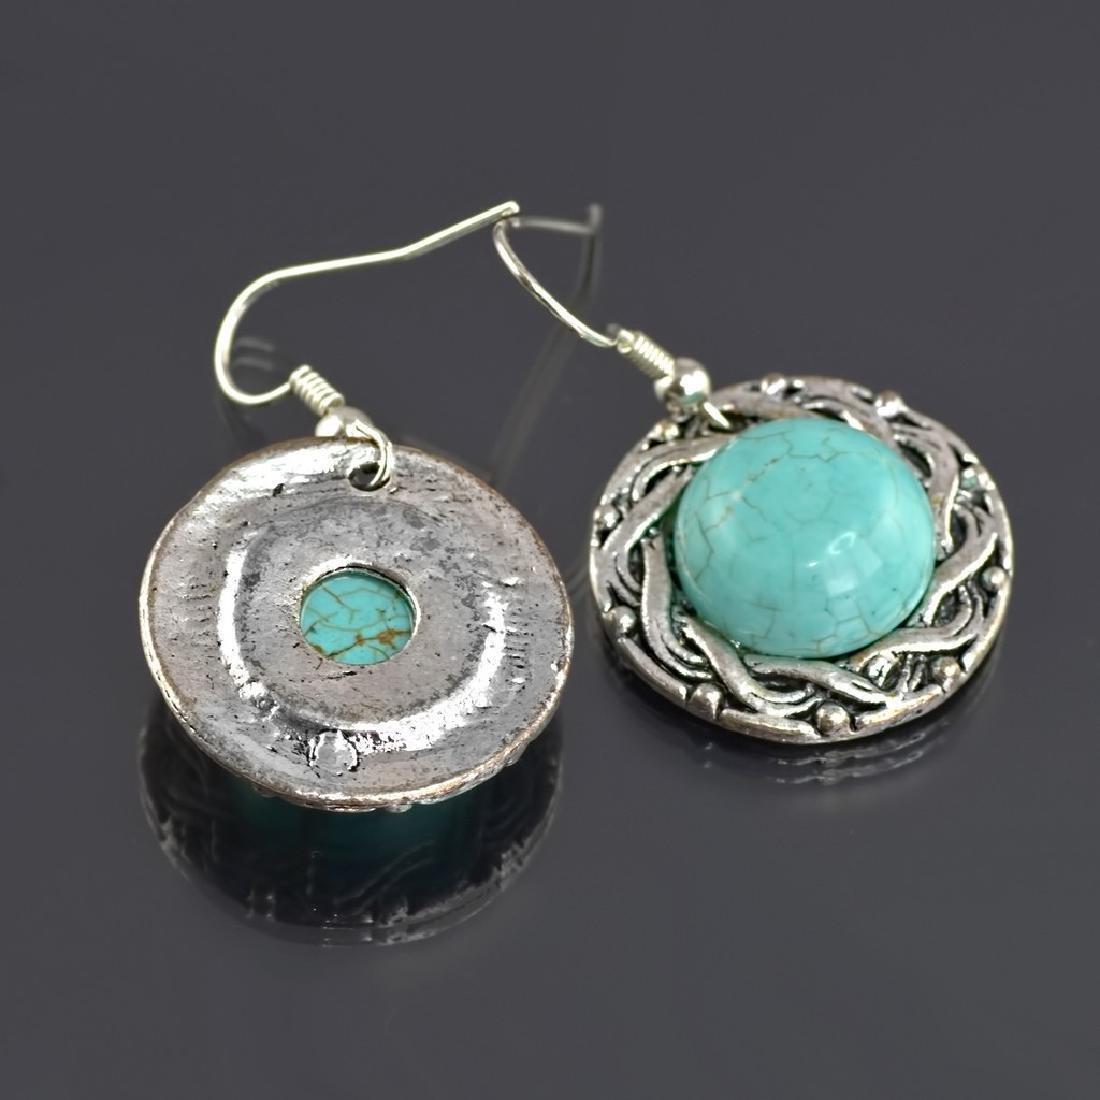 Ethnic Style Turquoise Howlite Earrings - 4